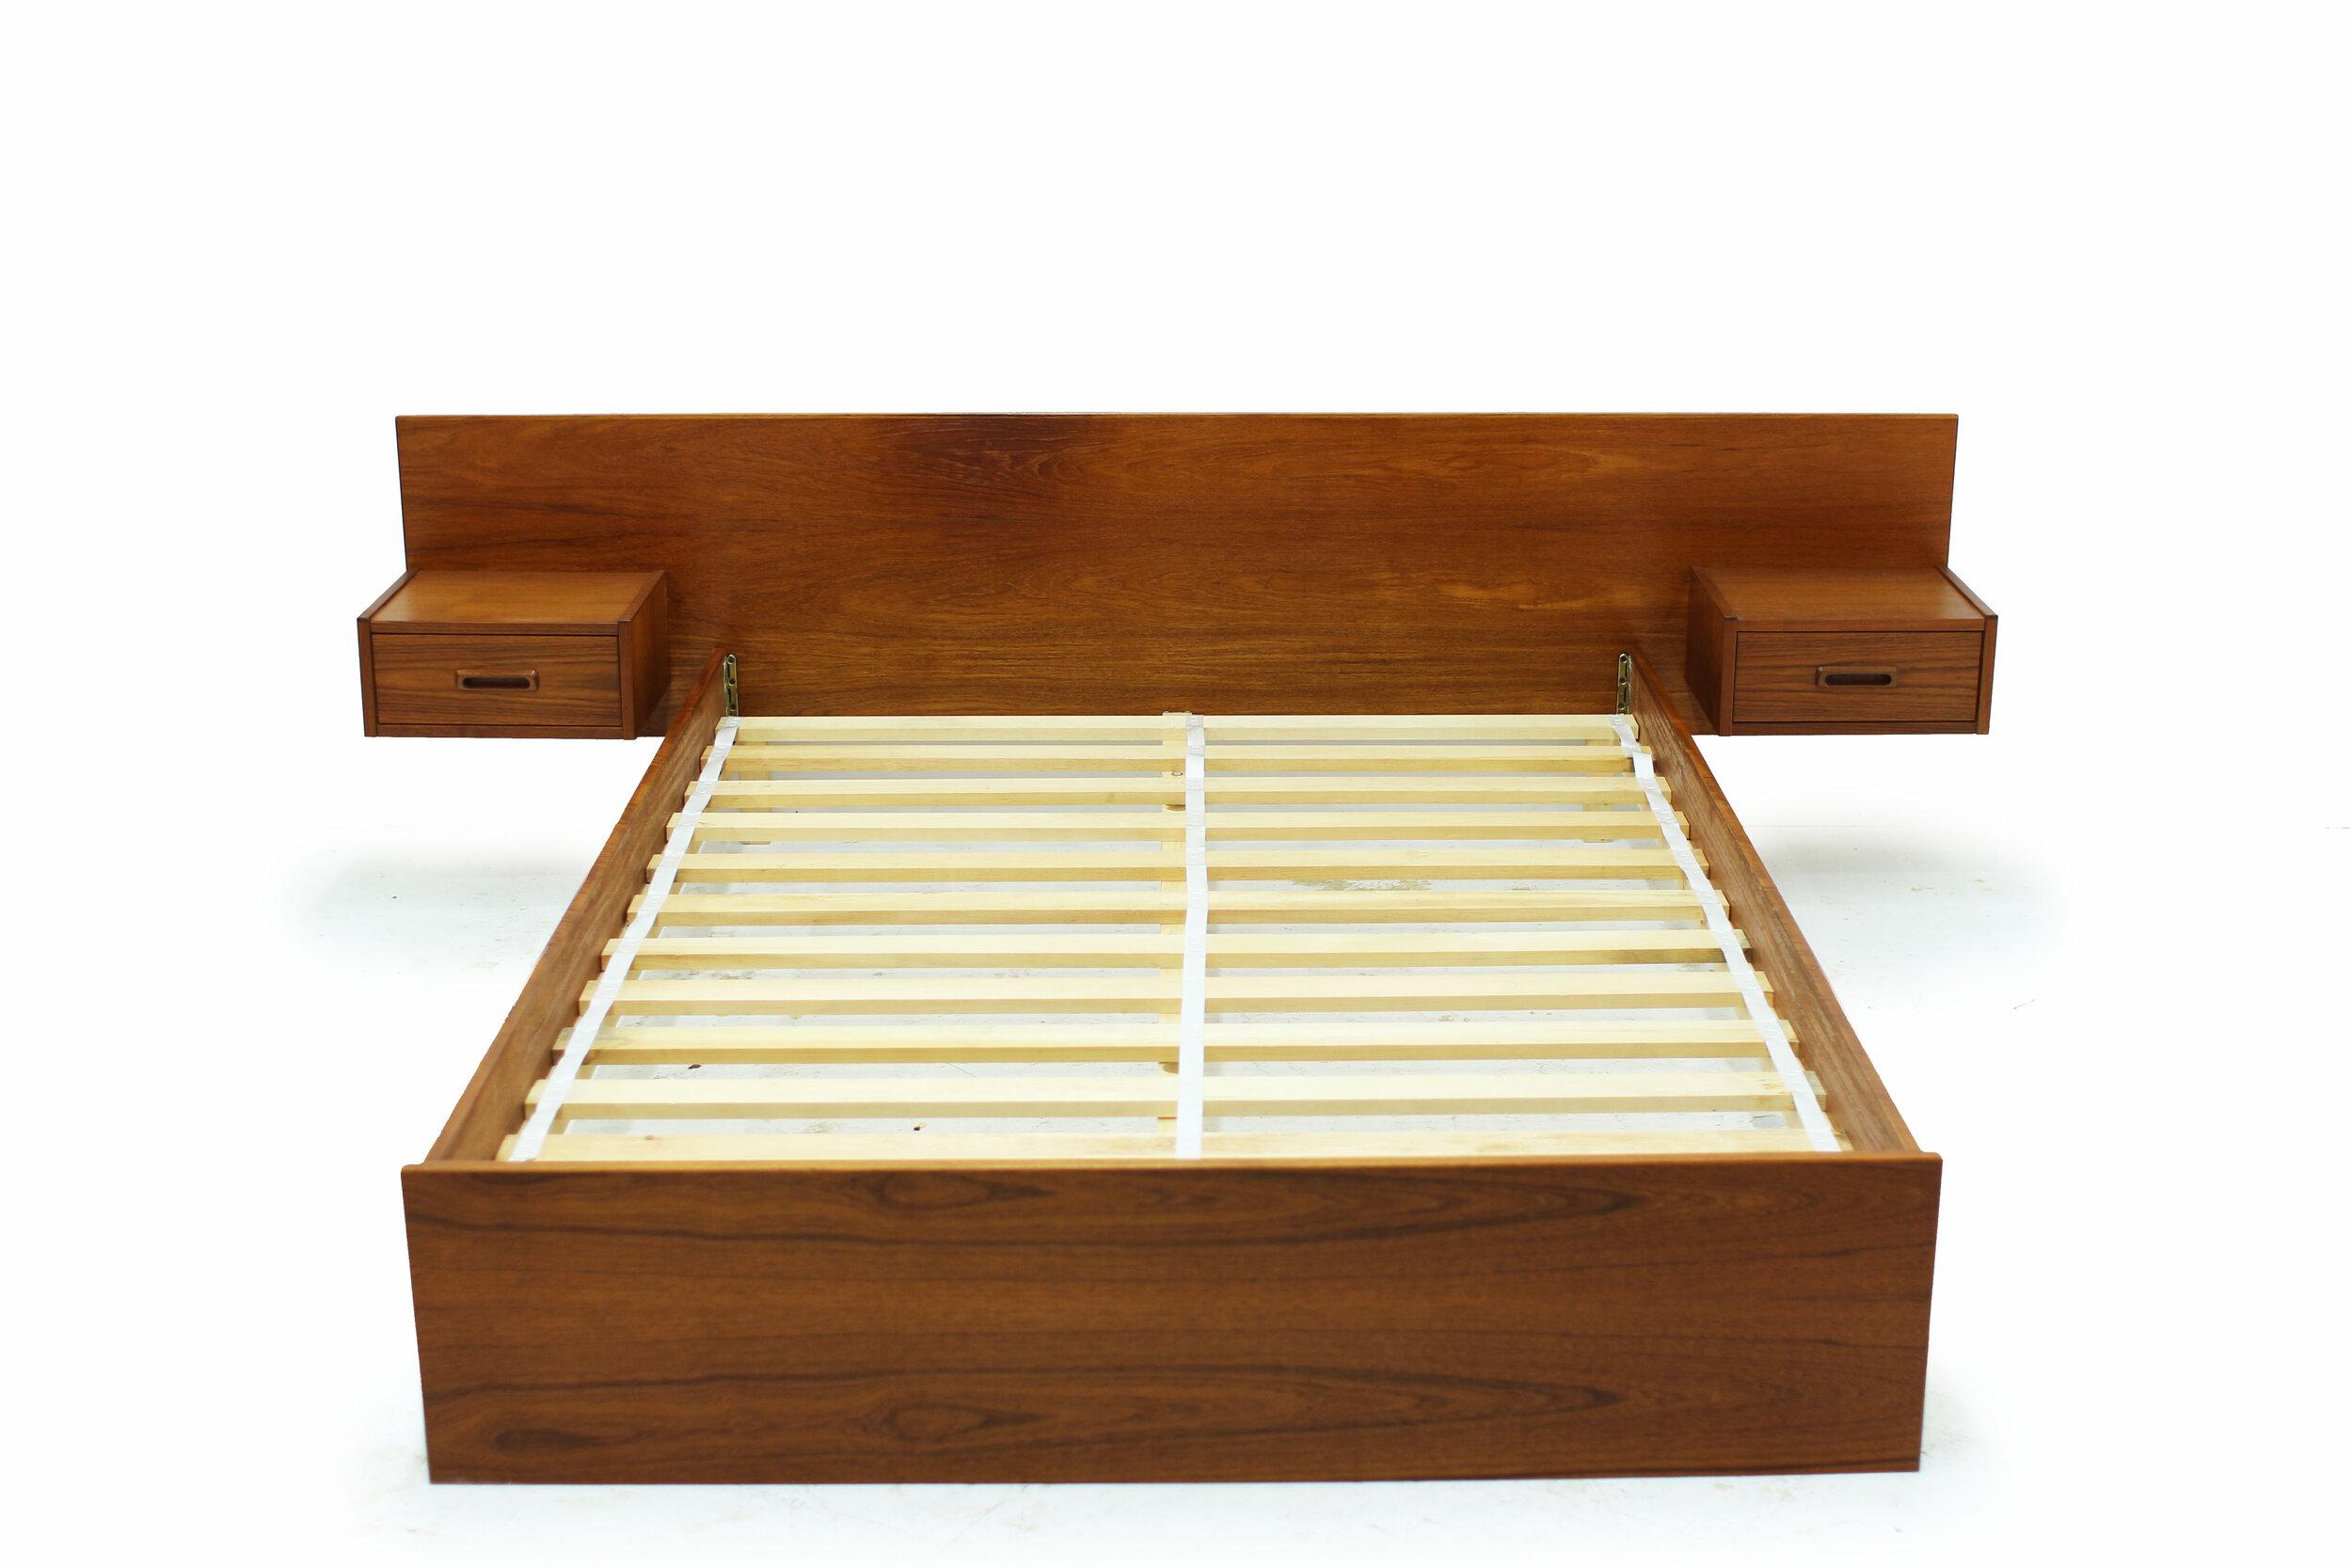 Mid Century Teak Double Platform Bed with Attached Nightstands (2).jpg